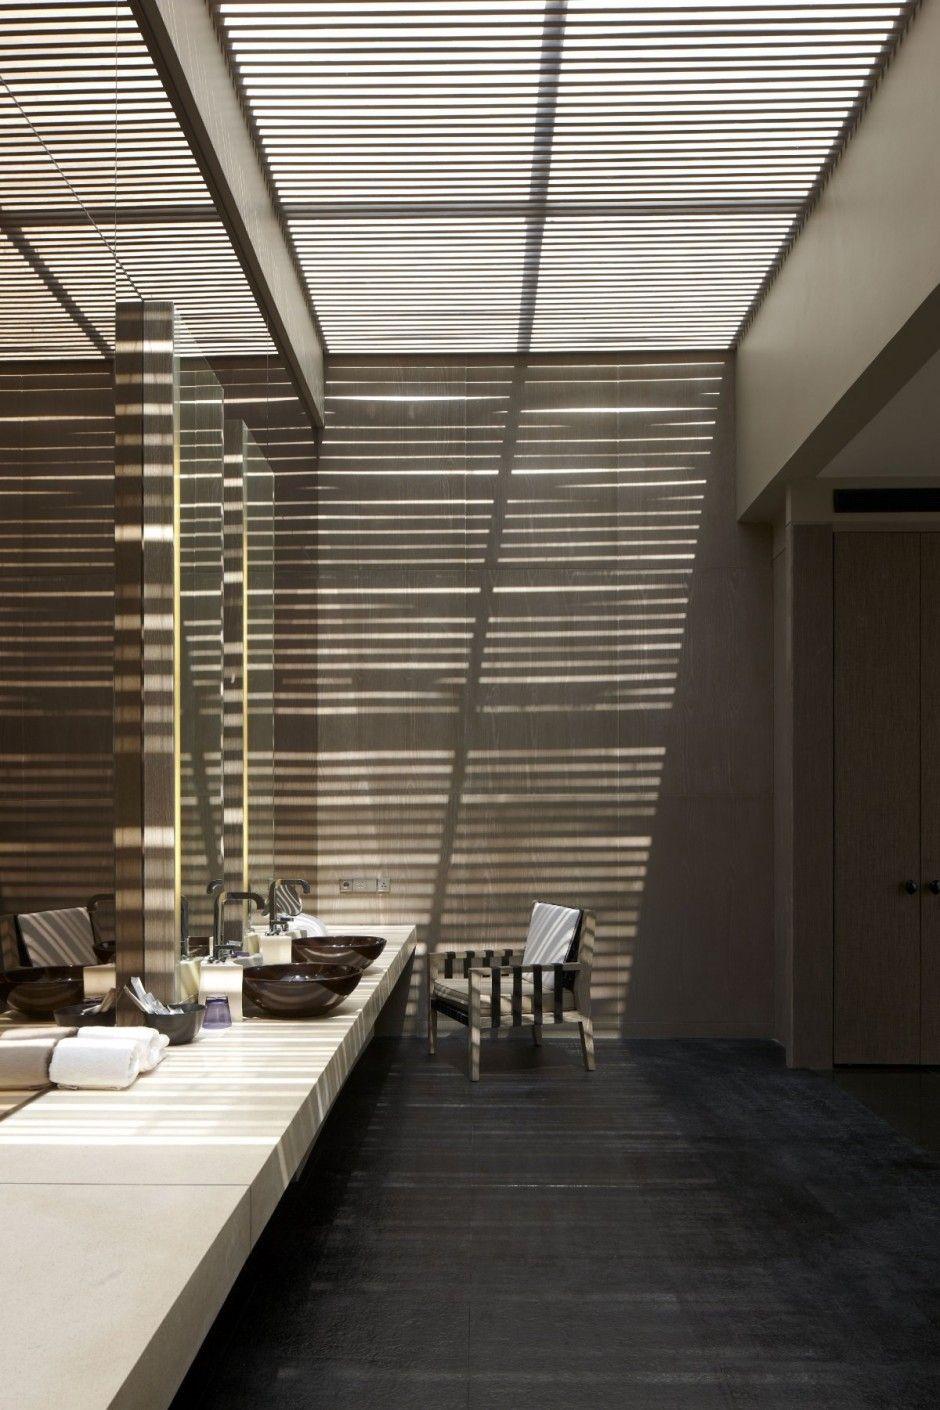 Villas and e wow suite interiors